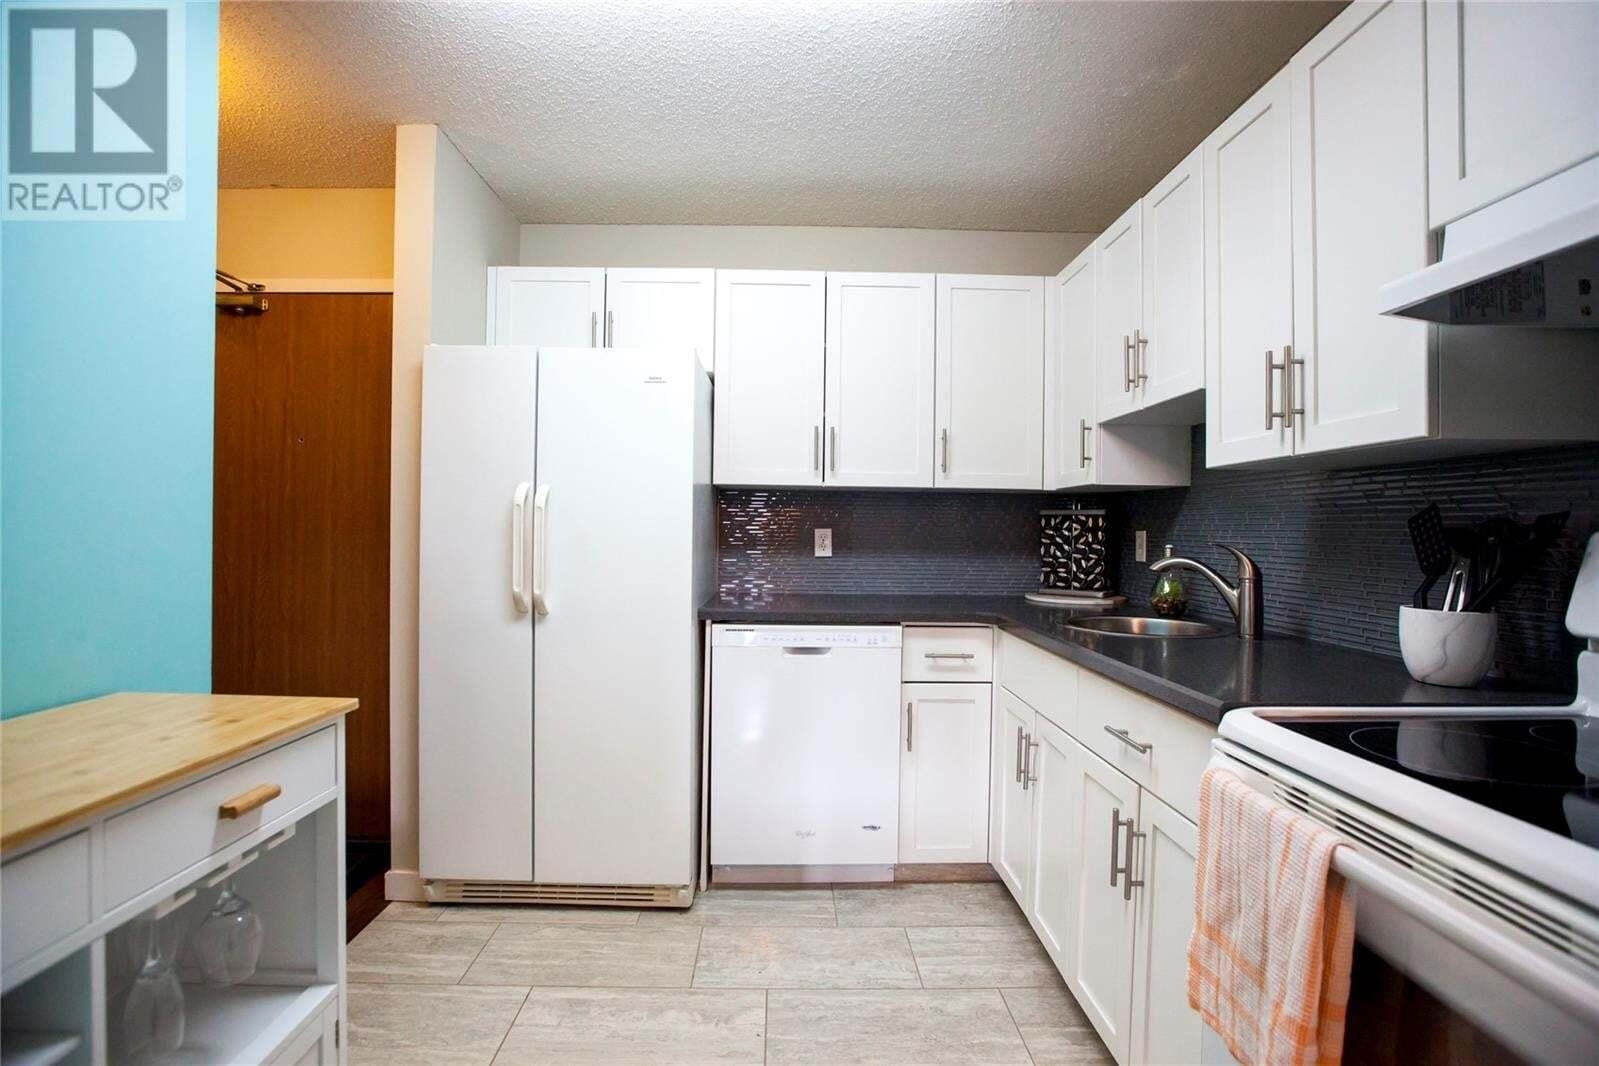 Condo for sale at 212 209b Cree Pl Saskatoon Saskatchewan - MLS: SK818497